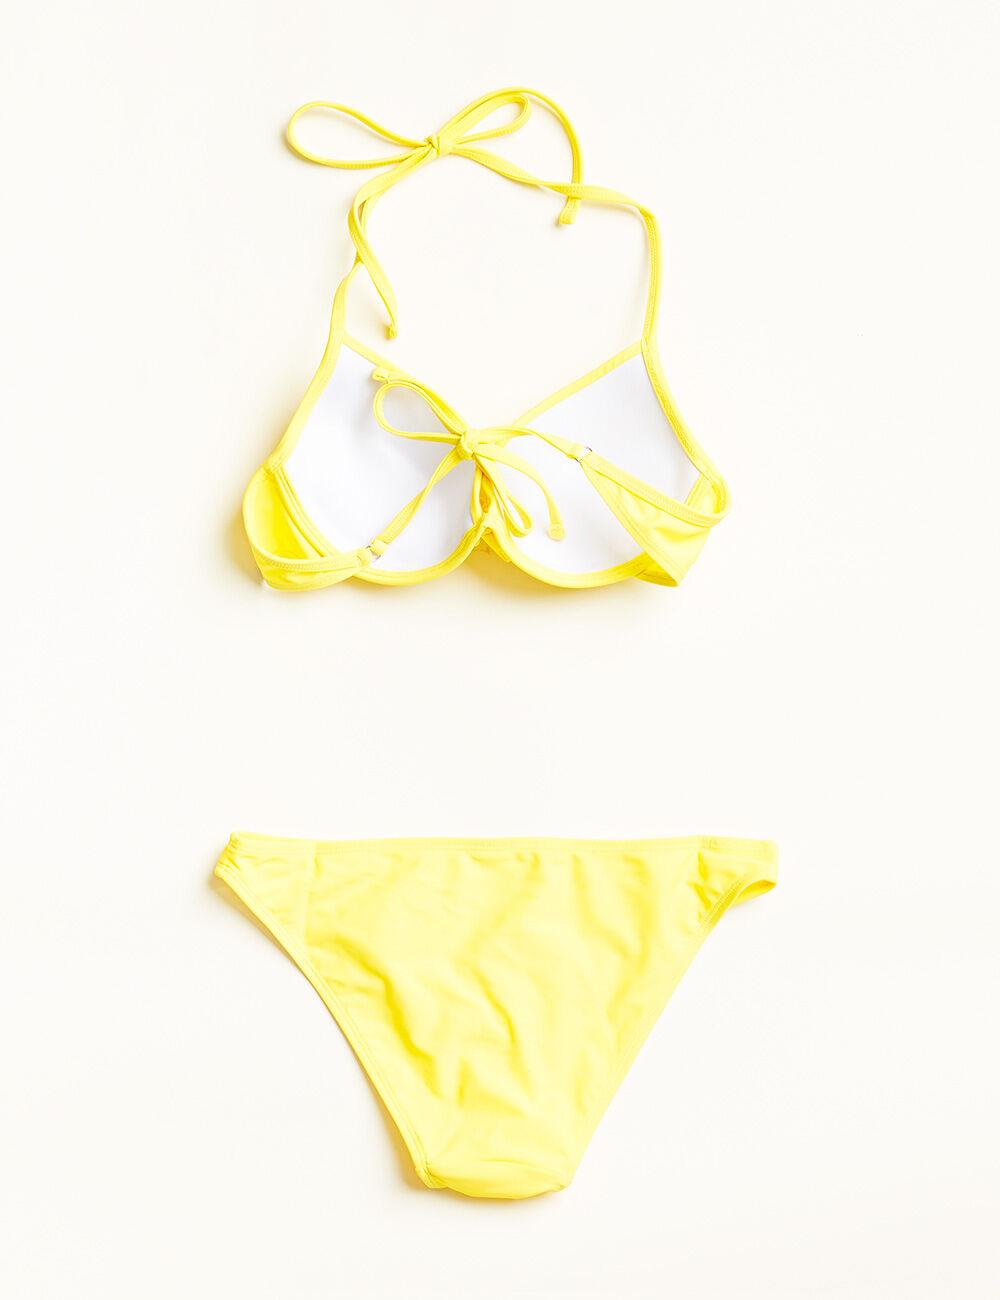 maillot de bain haut push up jaune femme jennyfer. Black Bedroom Furniture Sets. Home Design Ideas